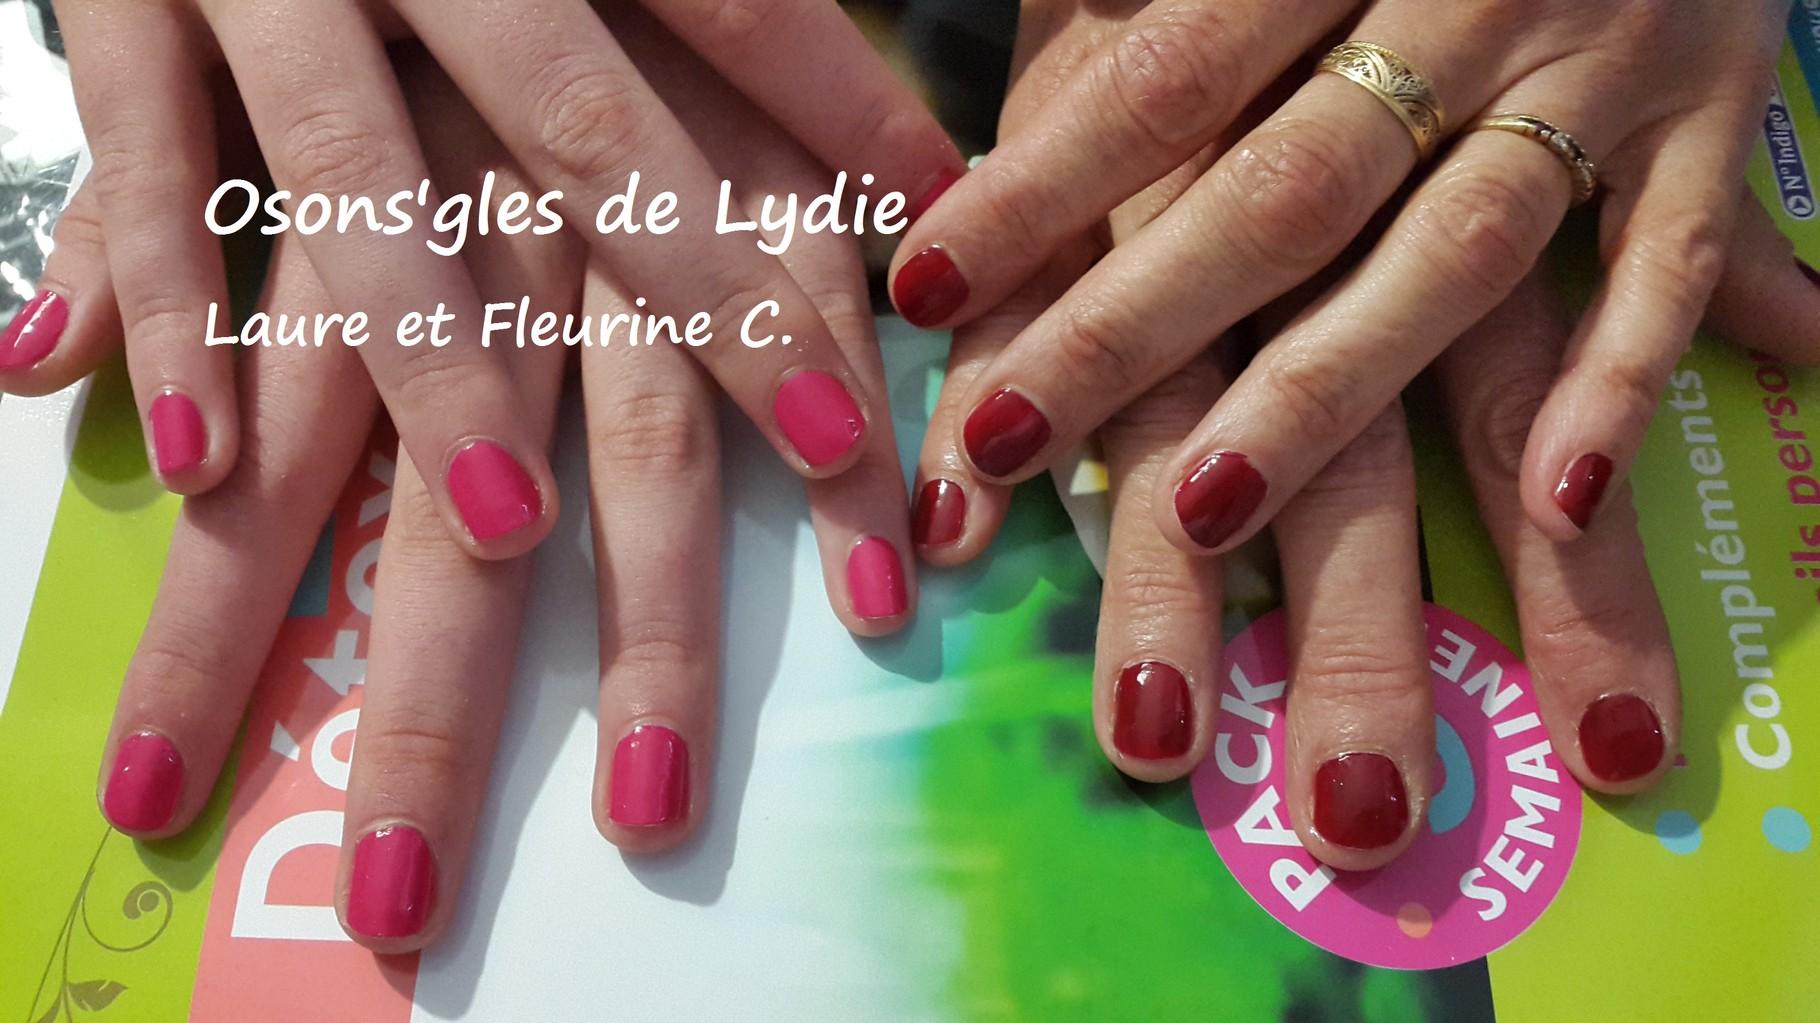 Vernis simple sur ongles naturels : Fleurine et Laure C.